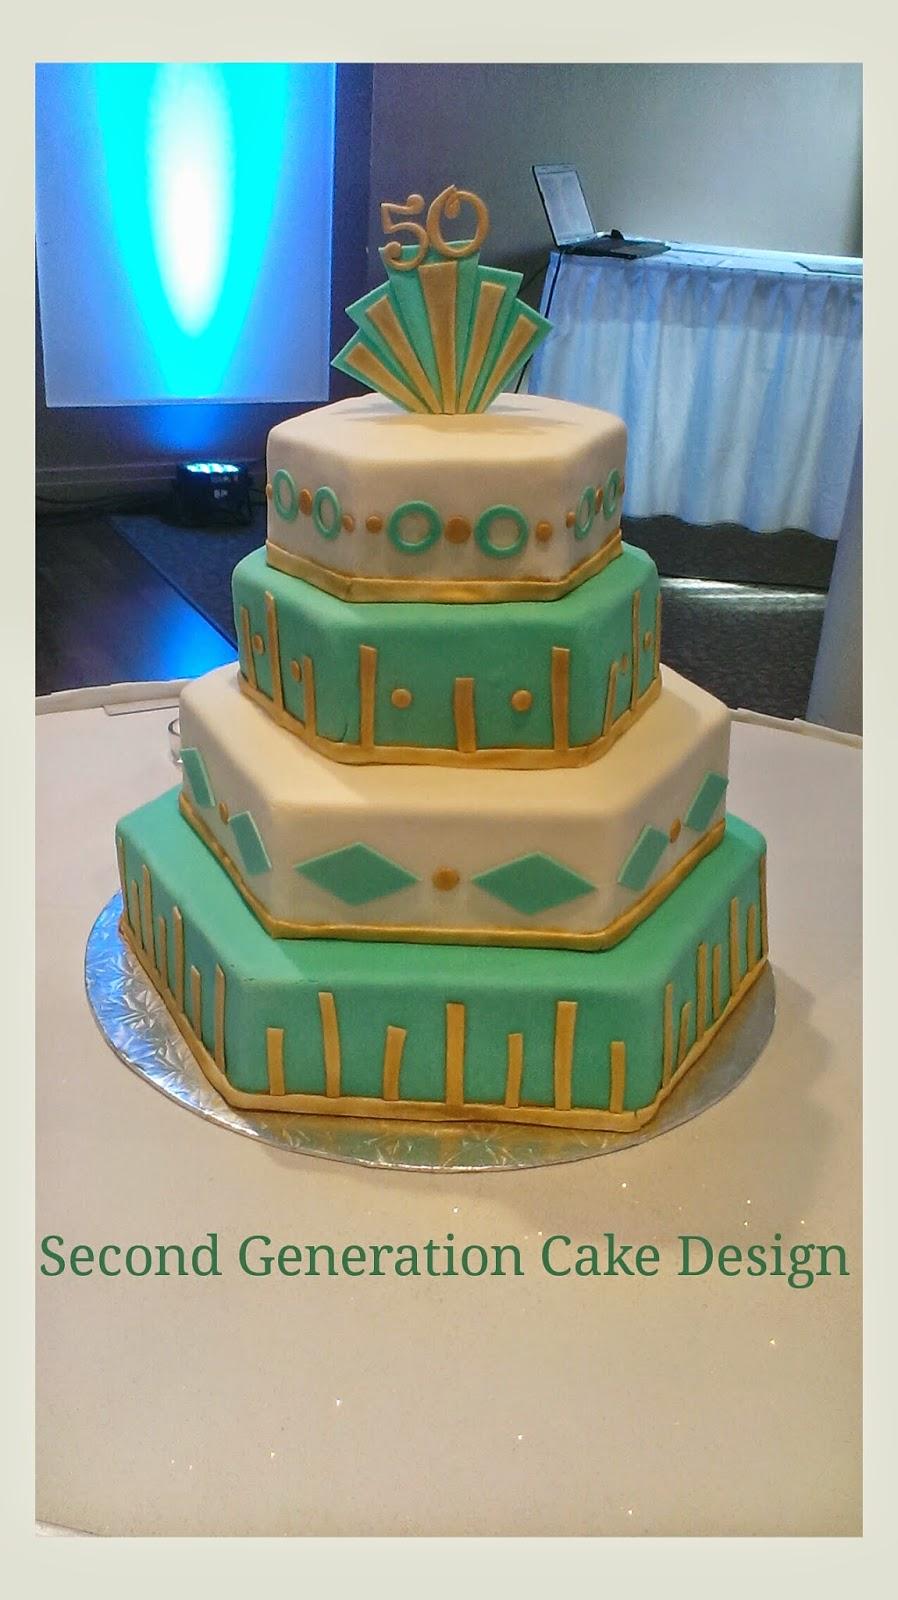 Second Generation Cake Design Art Deco 50th Birthday Cake